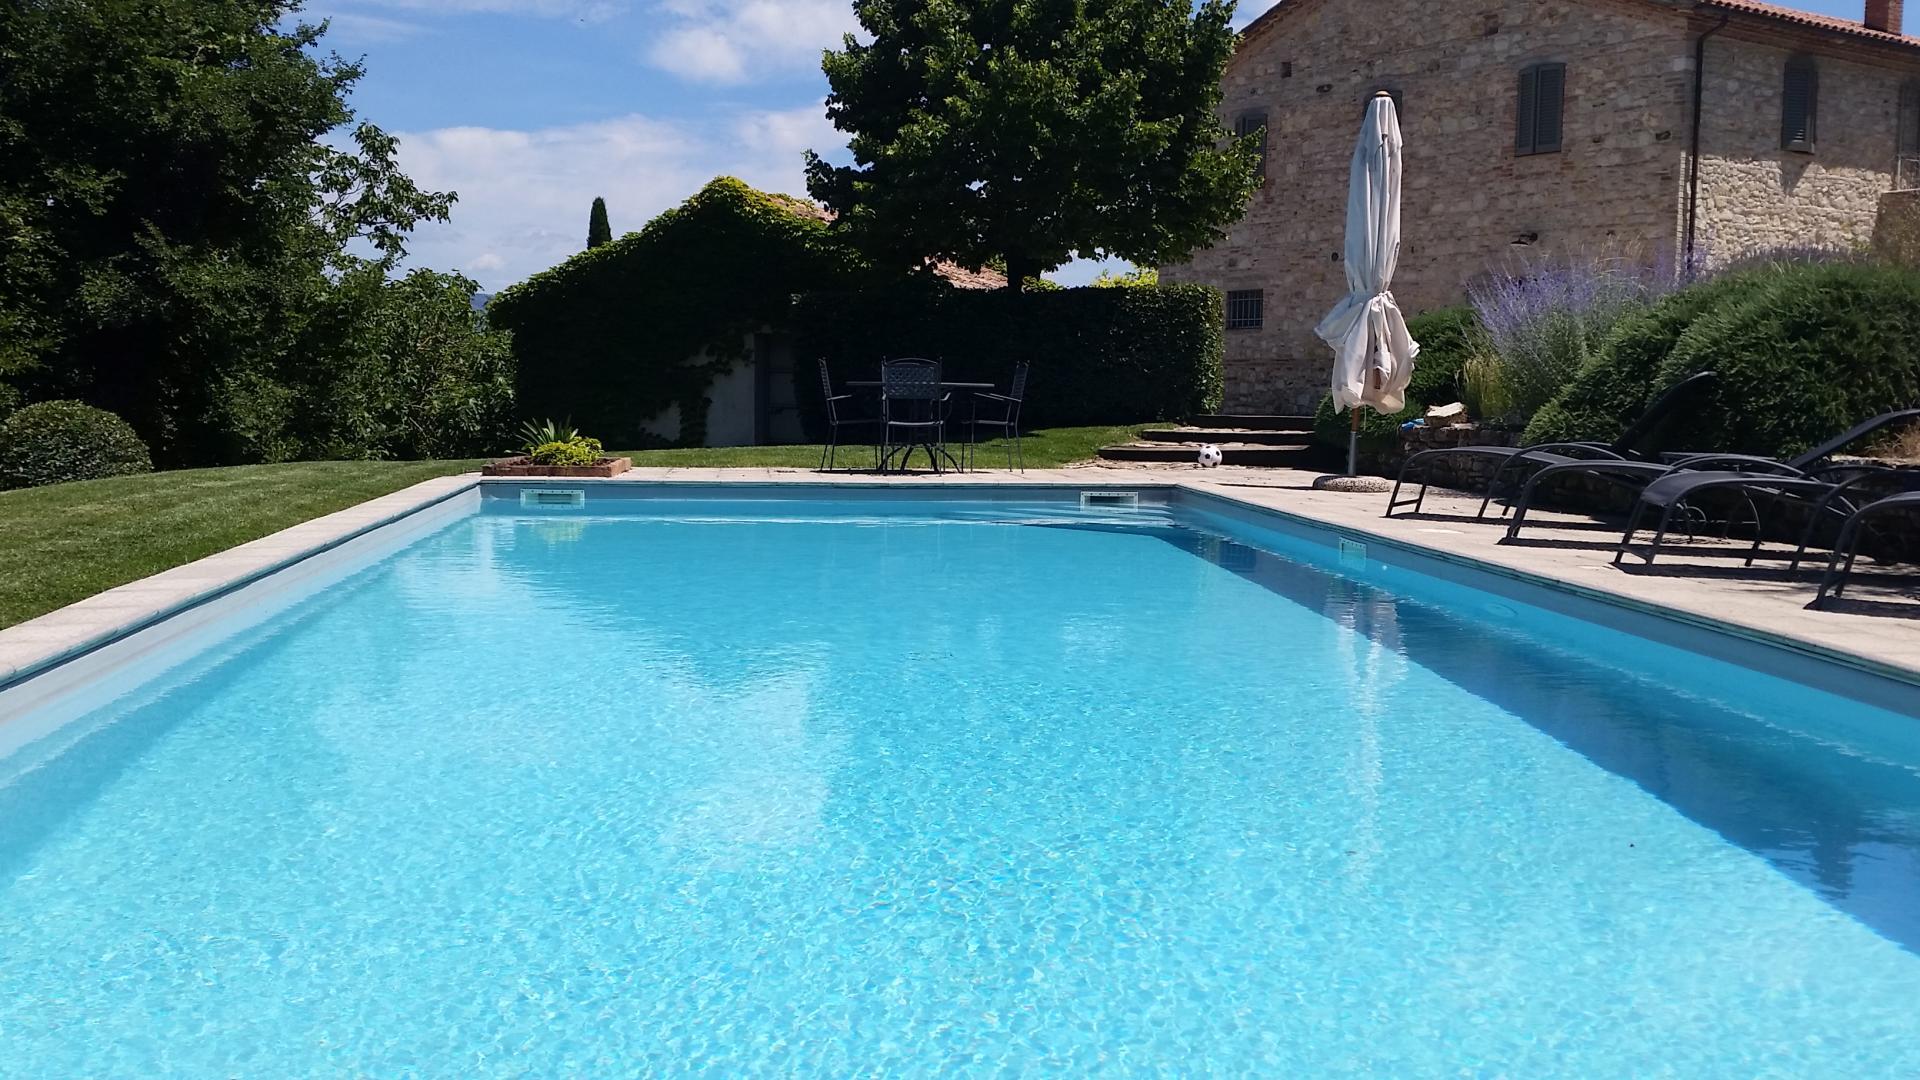 Outdoor Pool 4, Il Sismano, Avigliano Umbro, Umbria.